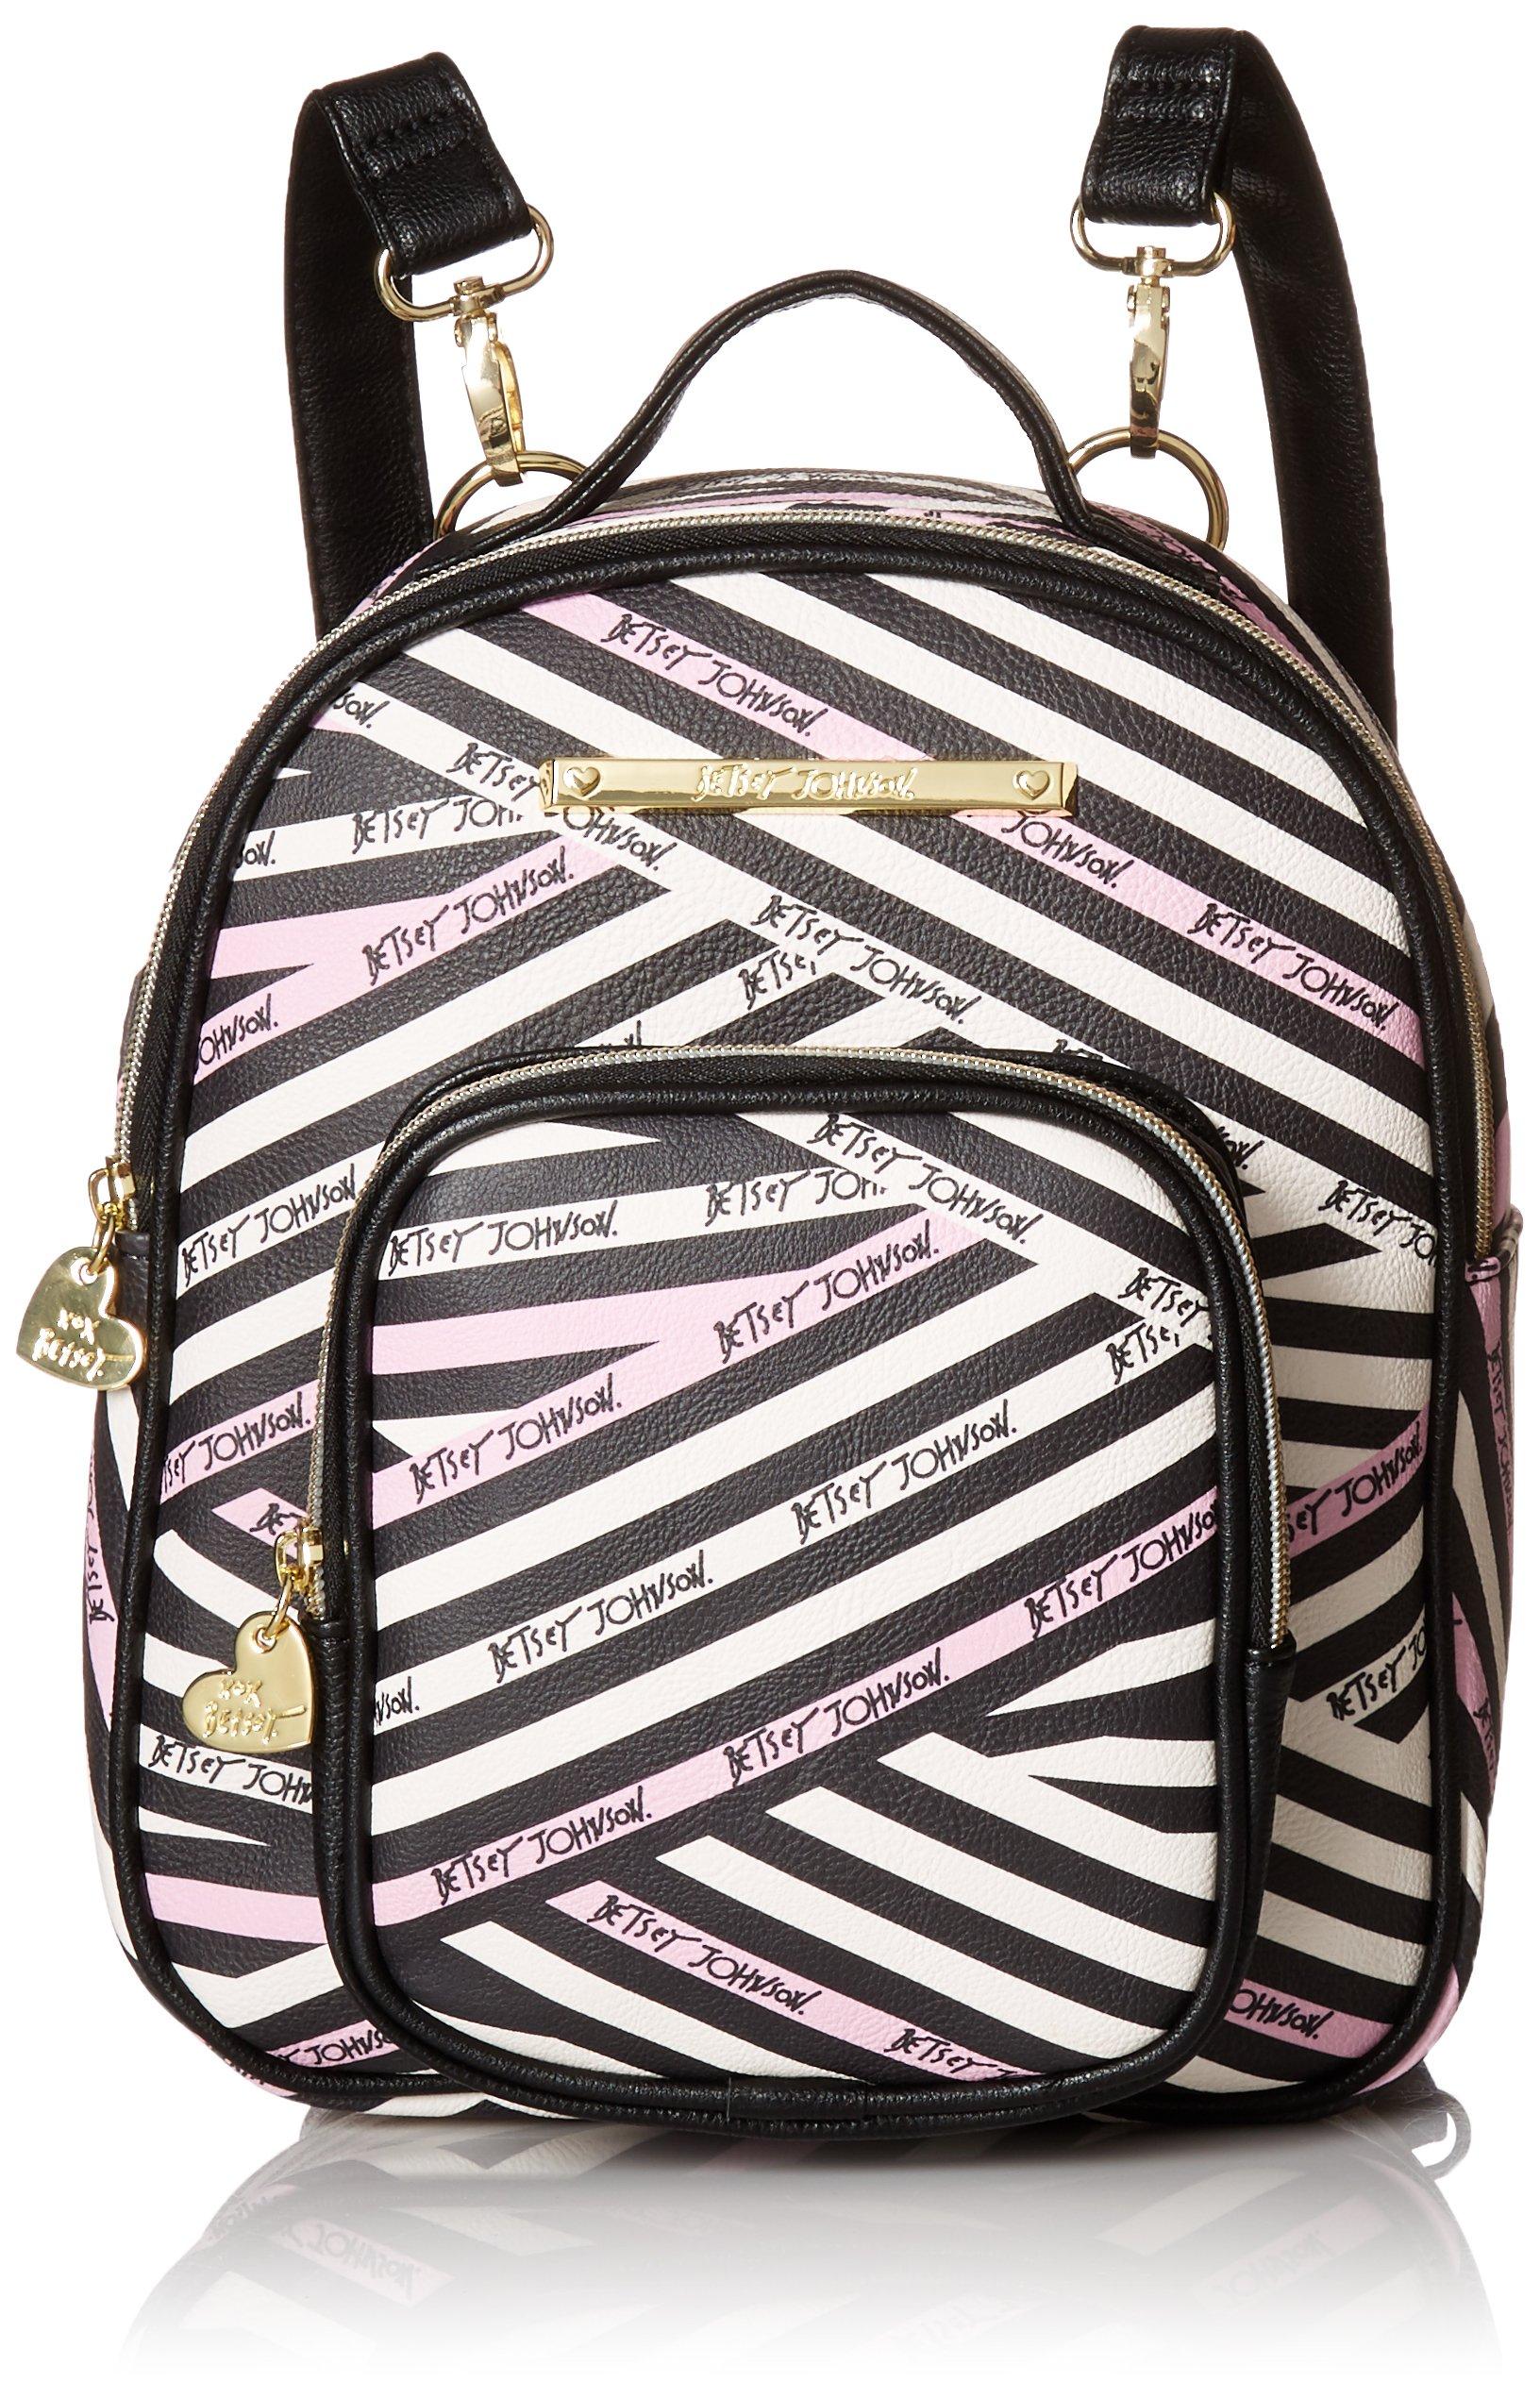 Betsey Johnson Women's Mini Convertible Backpack Multi One Size by Betsey Johnson (Image #1)